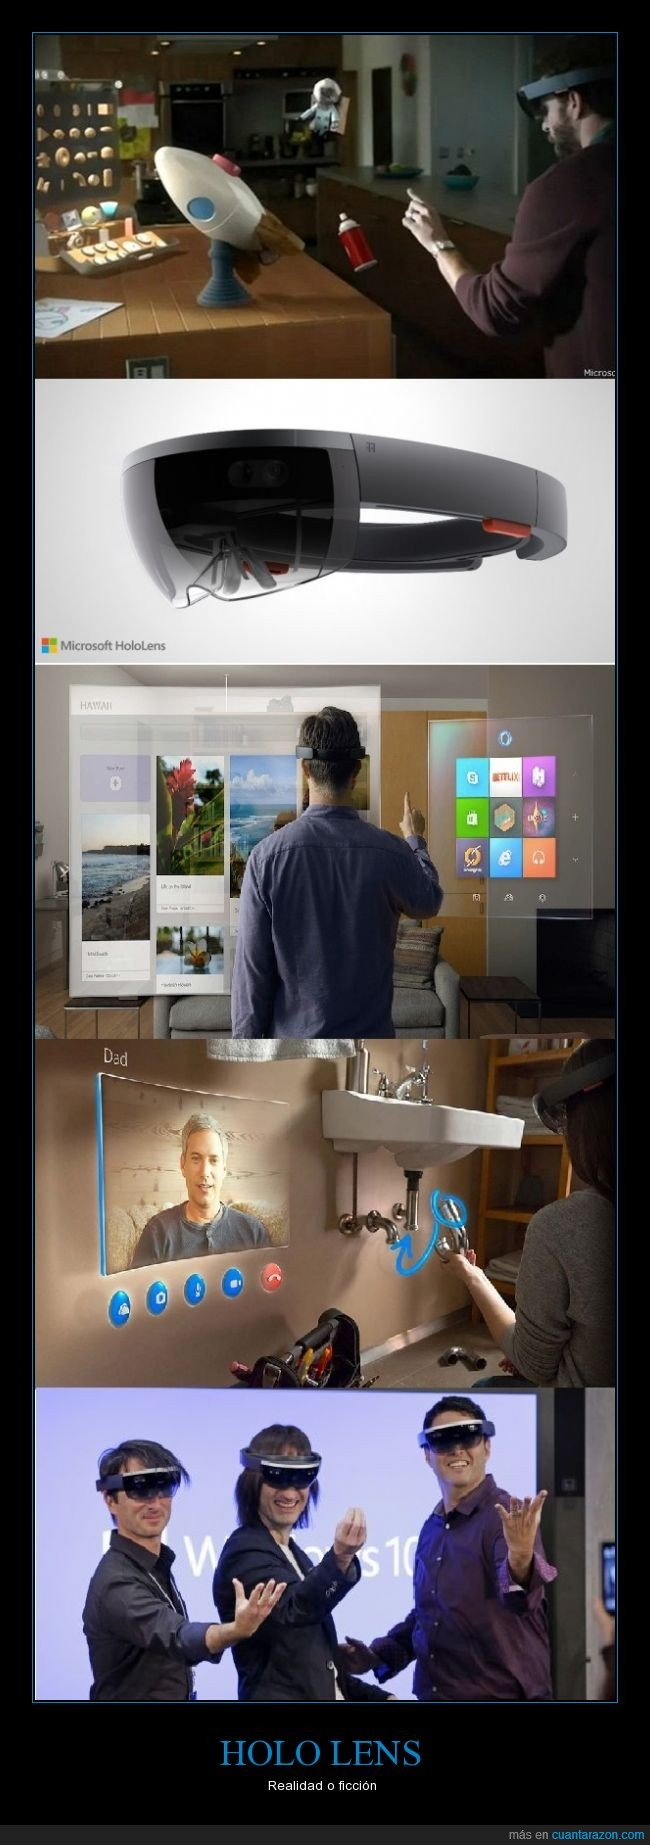 ficcion,futuro,Hologramas,lentes,Microsoft,realidad